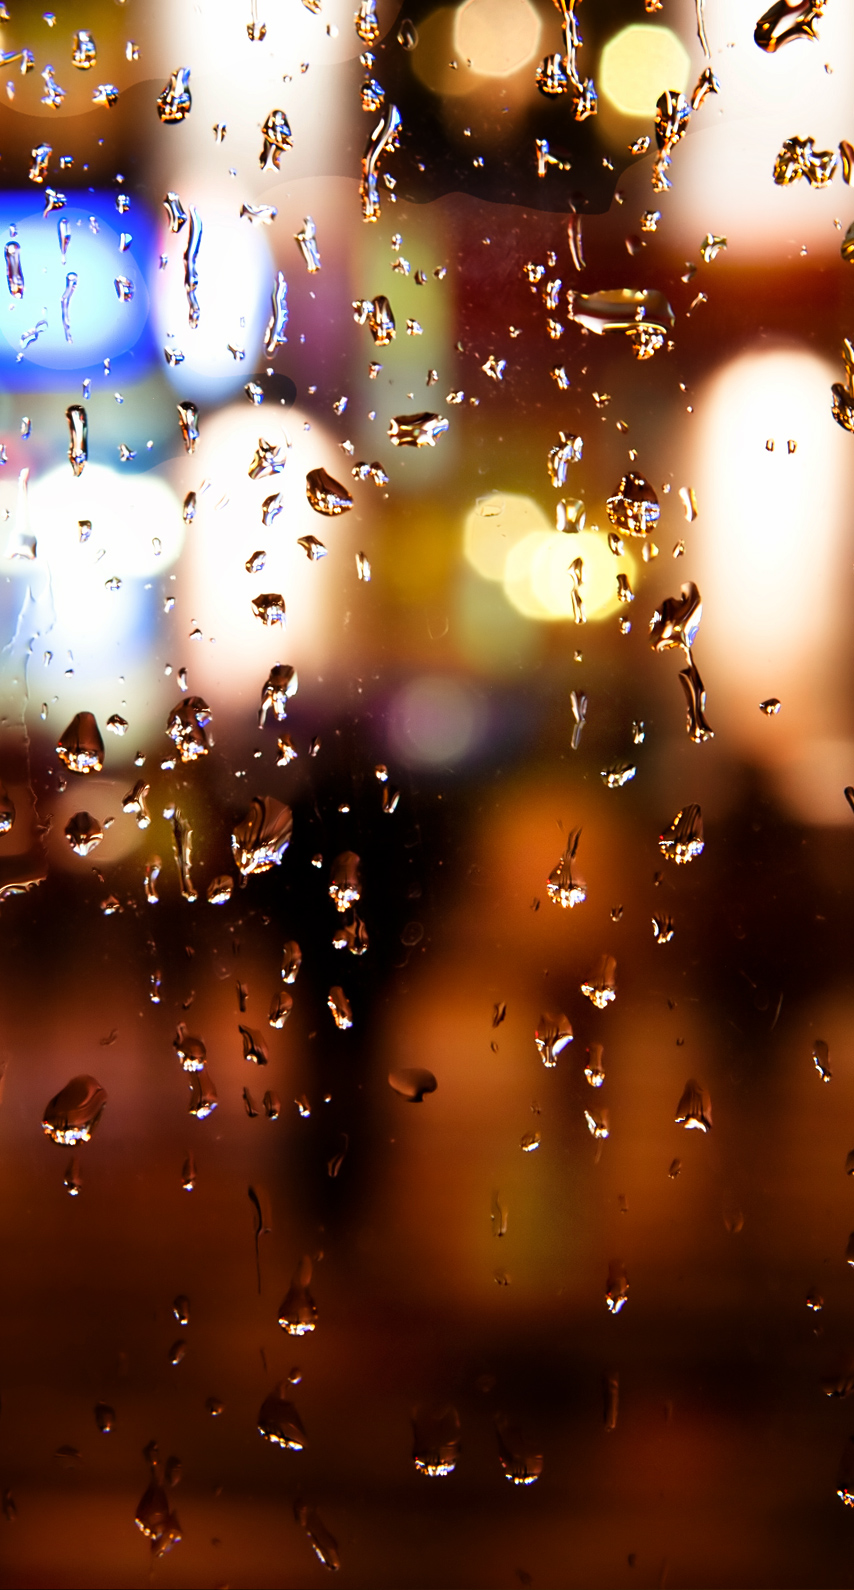 window, raining